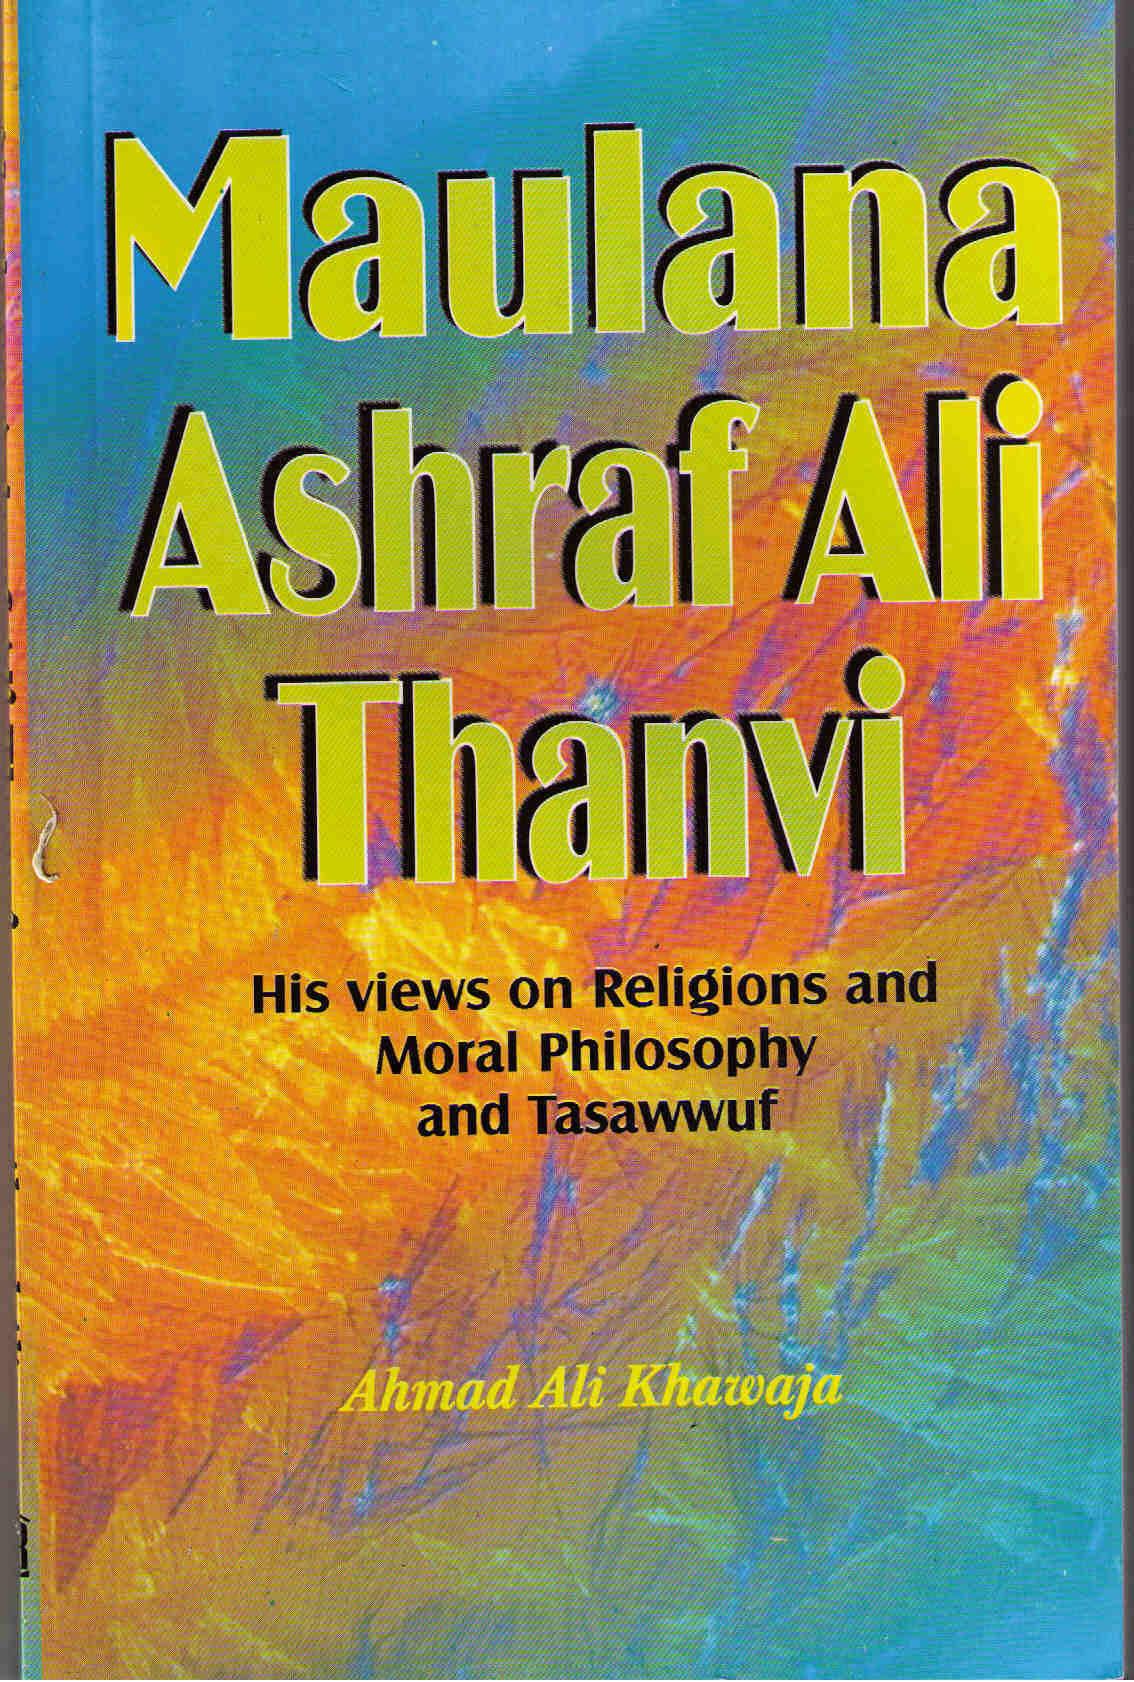 Maulana Ashraf Ali Thanwi:His views on religion, Tasawwuf and